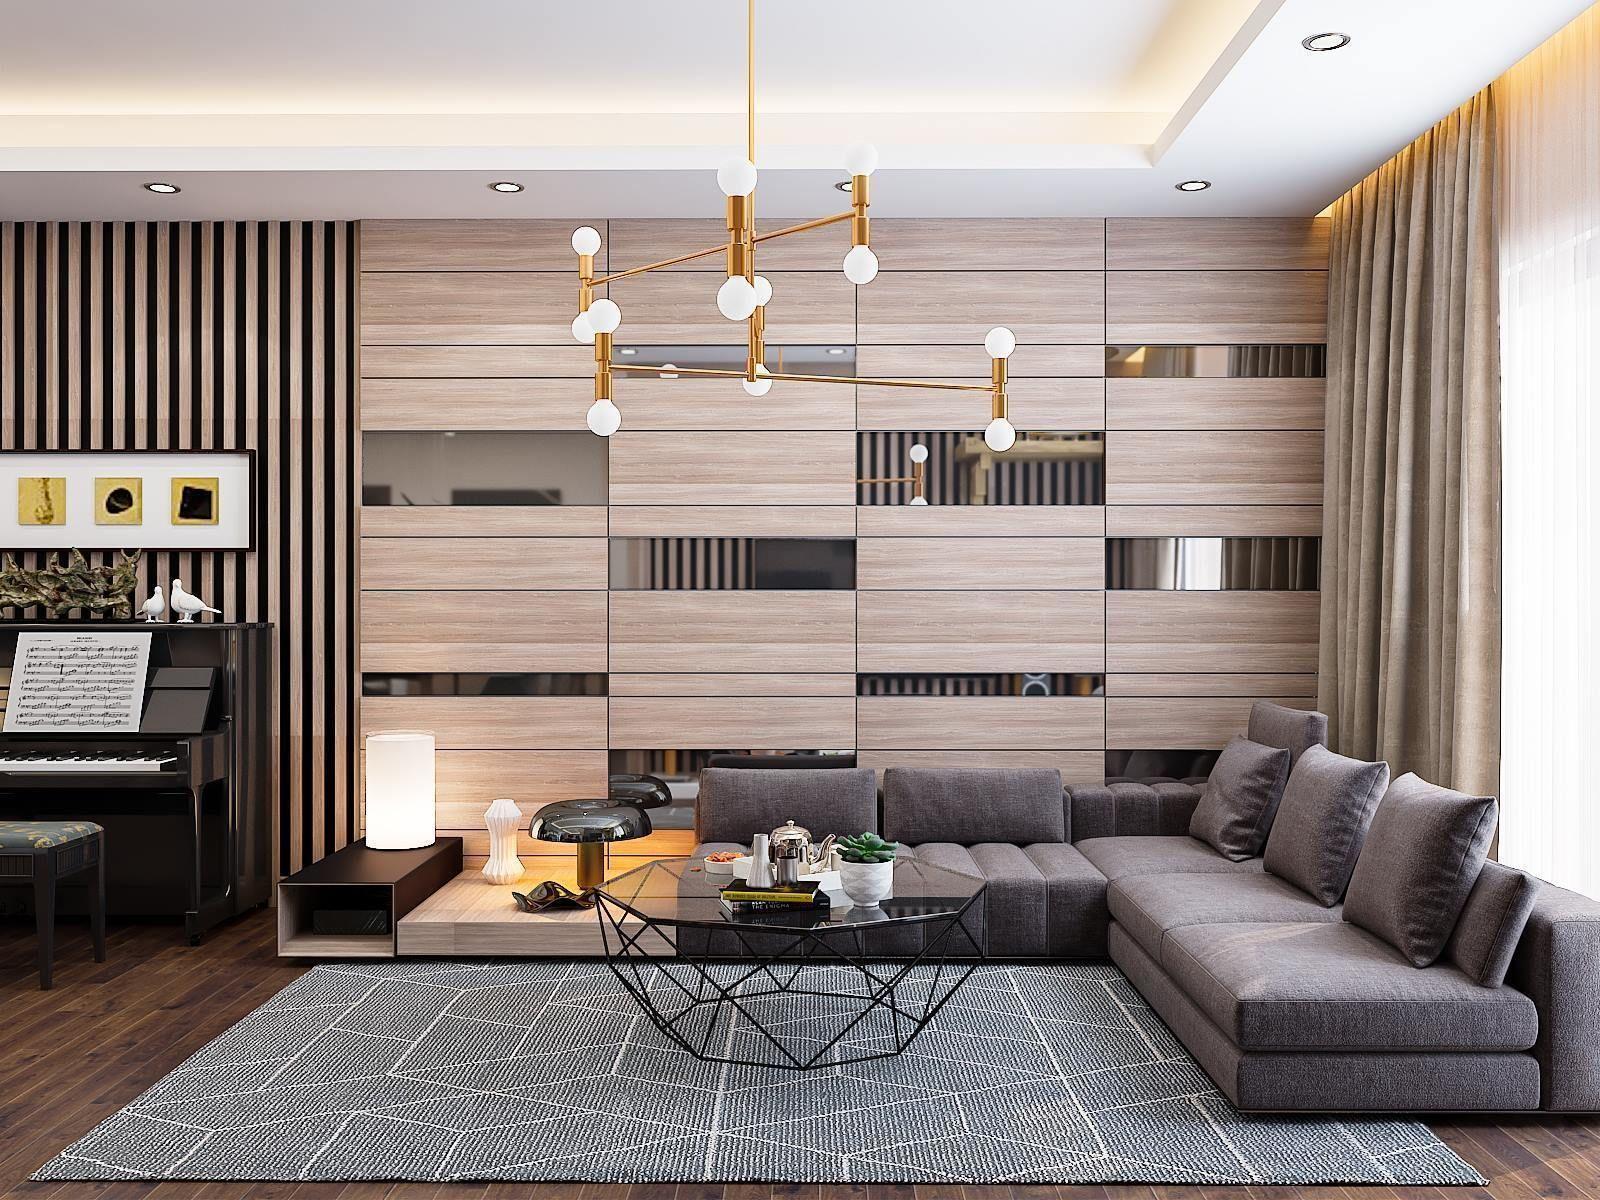 apartment living room hall kichen scene 3d model 1